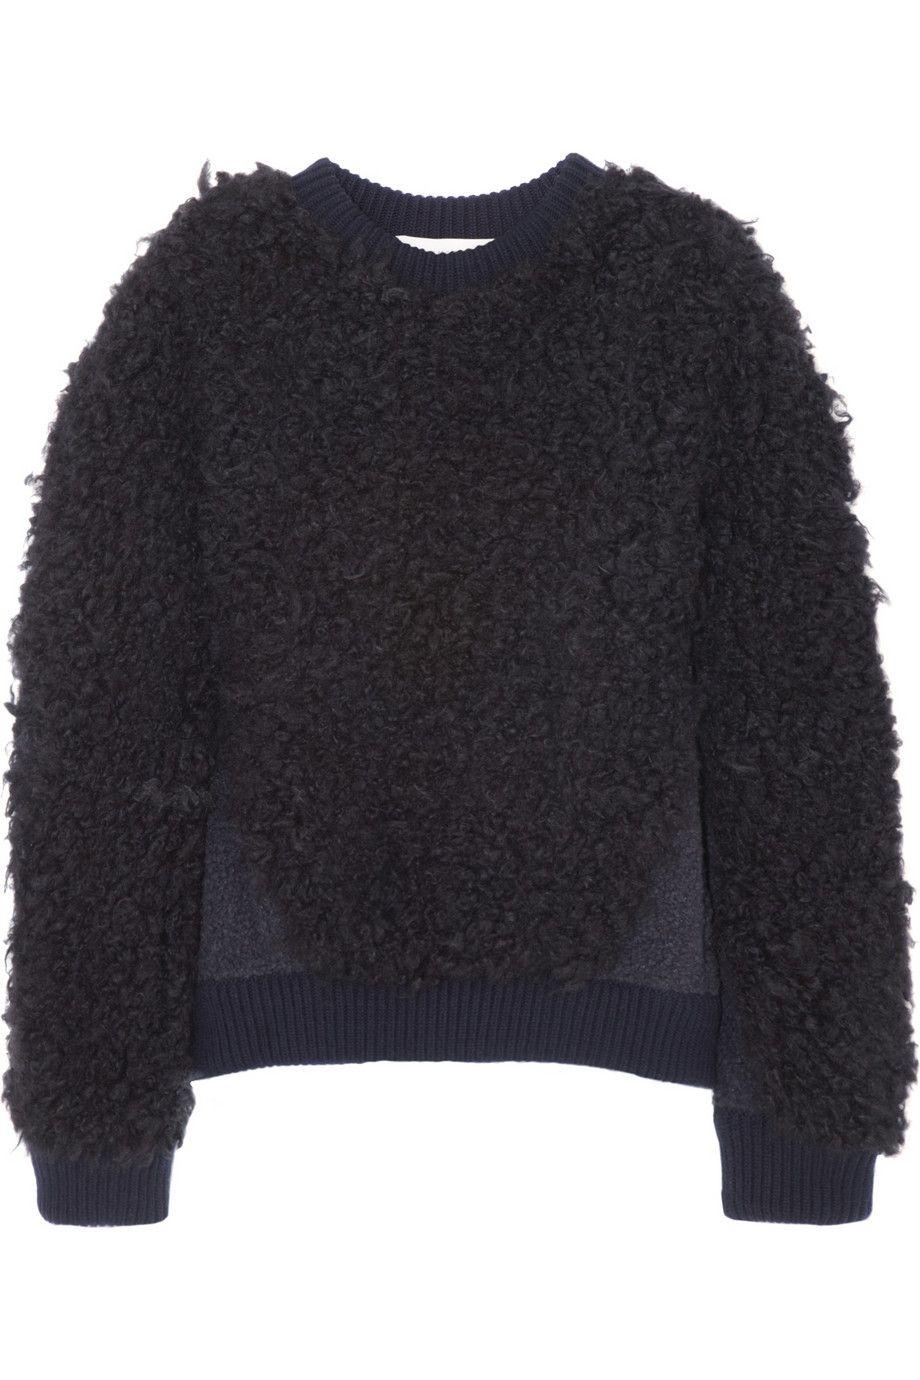 Stella McCartney|Shearling-effect knitted sweater|NET-A-PORTER.COM